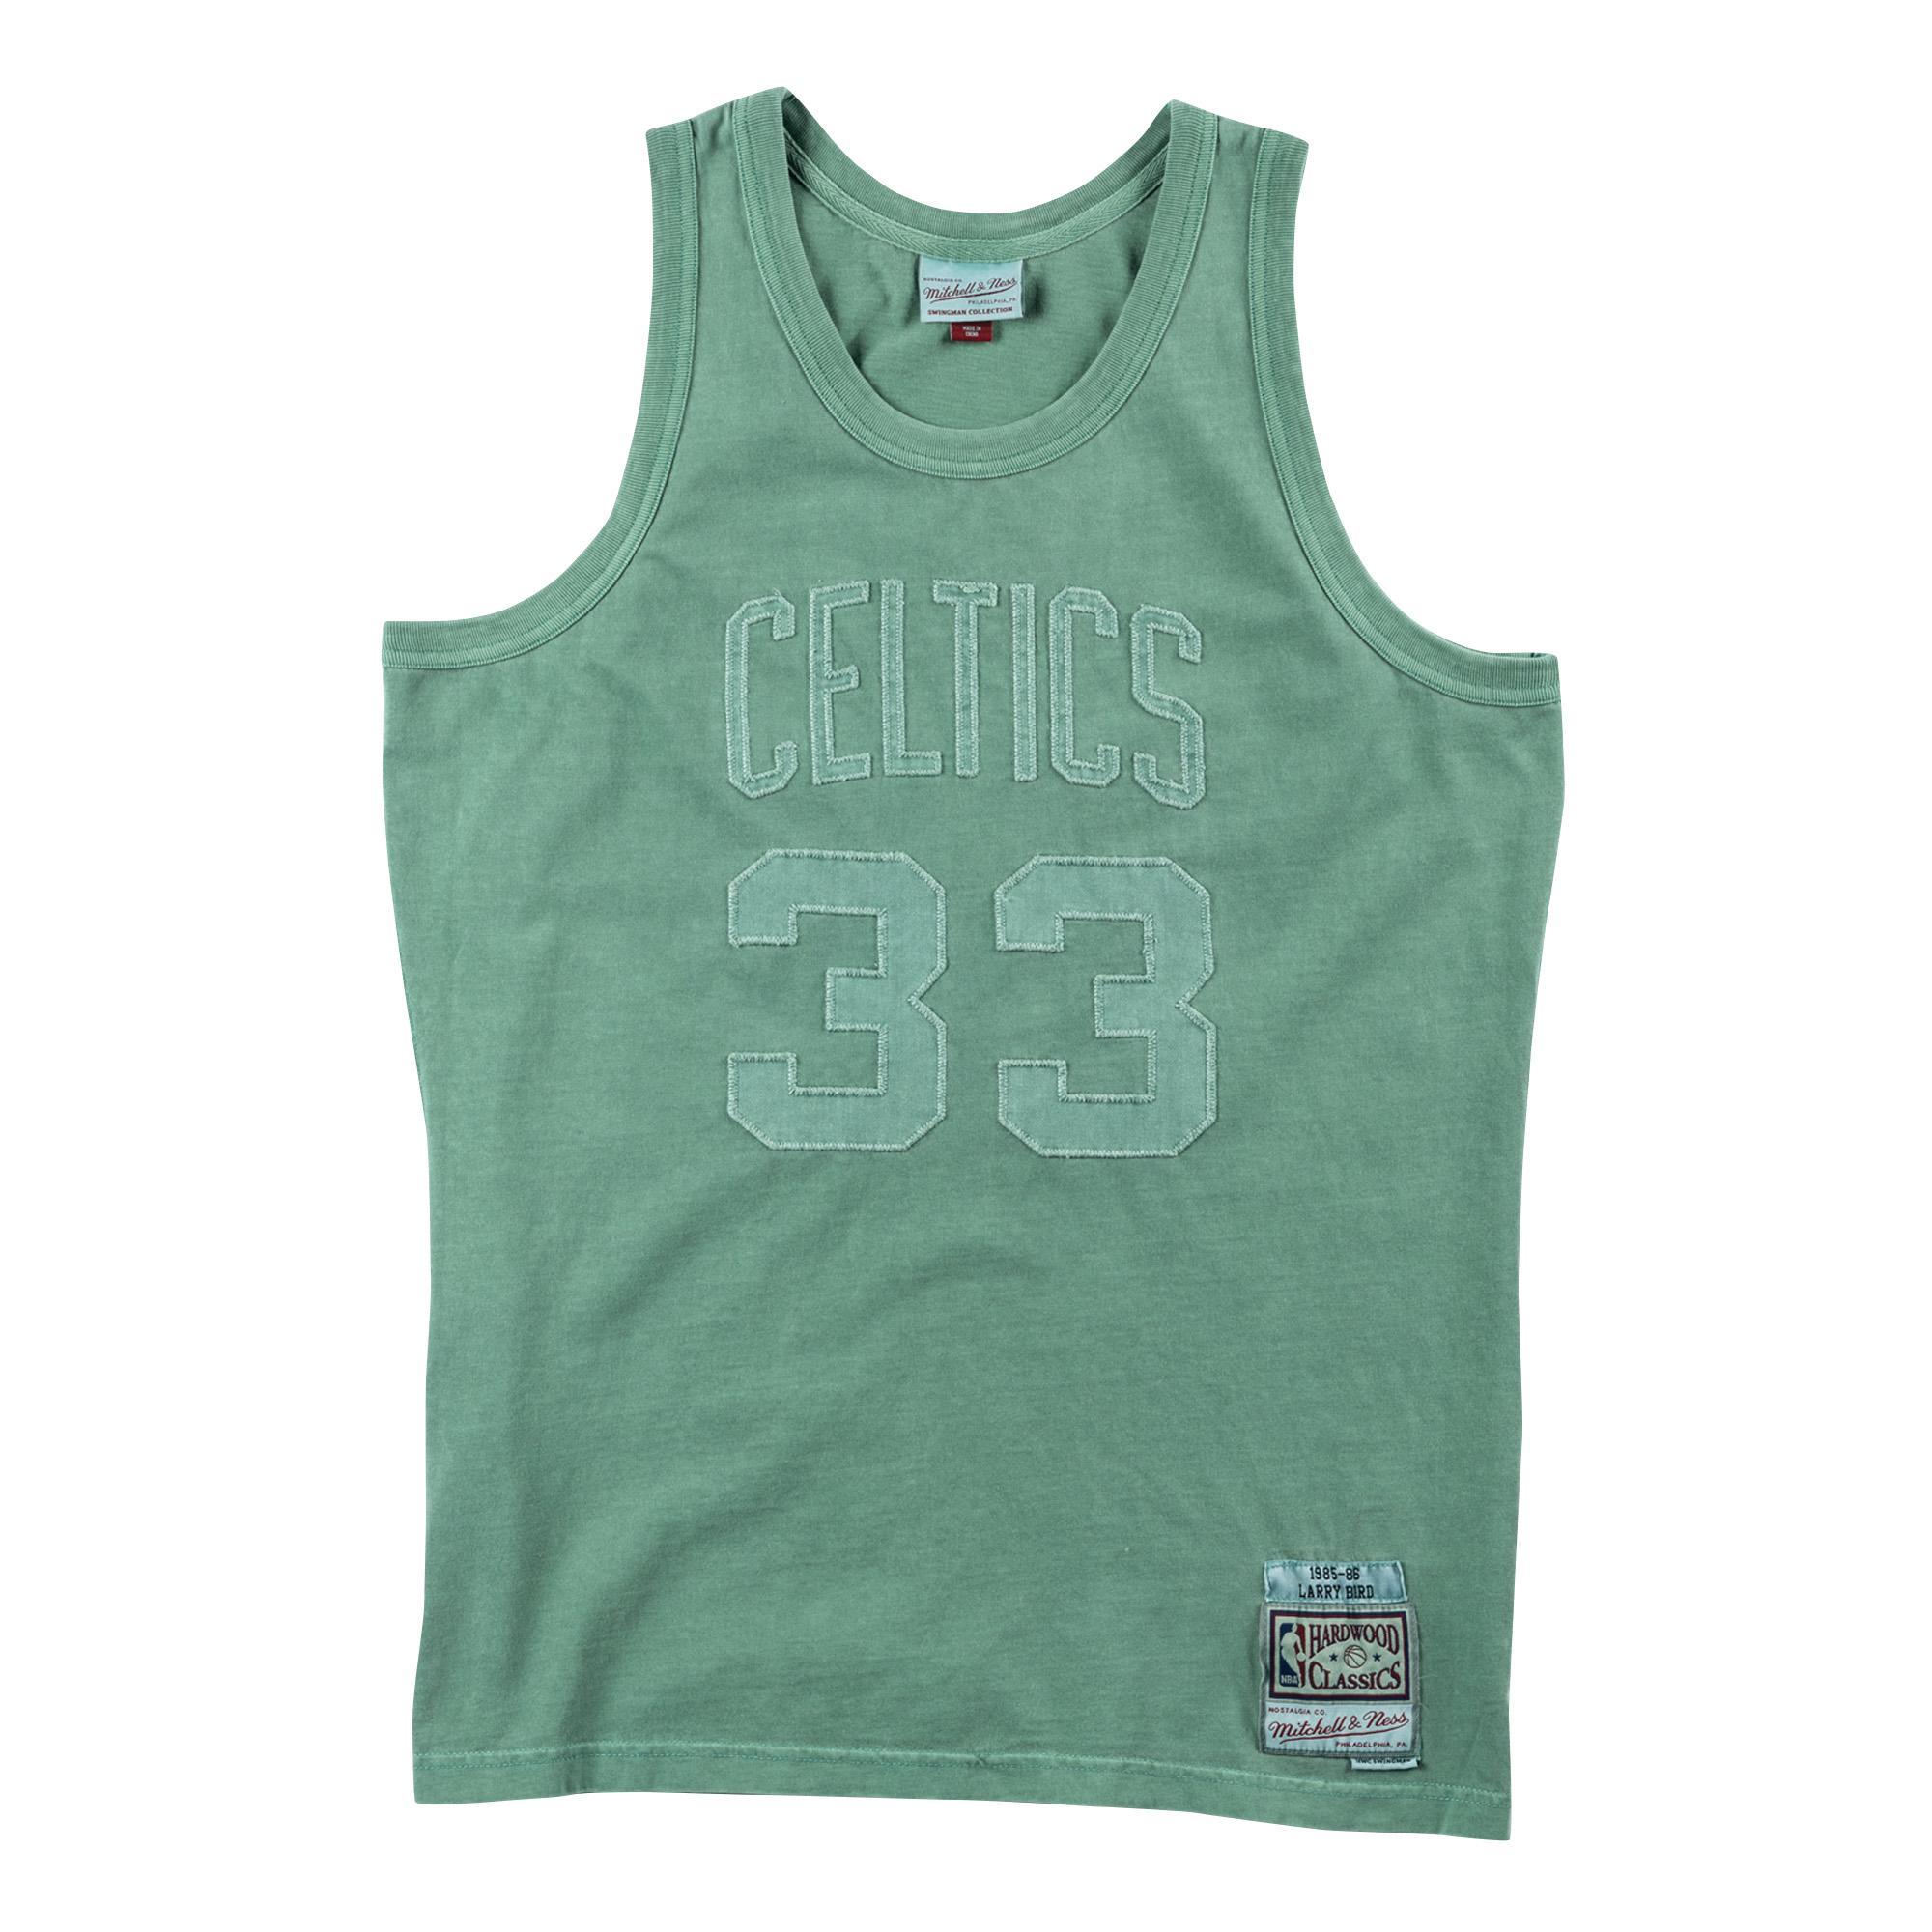 b59ab293d5f Washed Out Swingman Jersey Larry Bird Boston Celtics